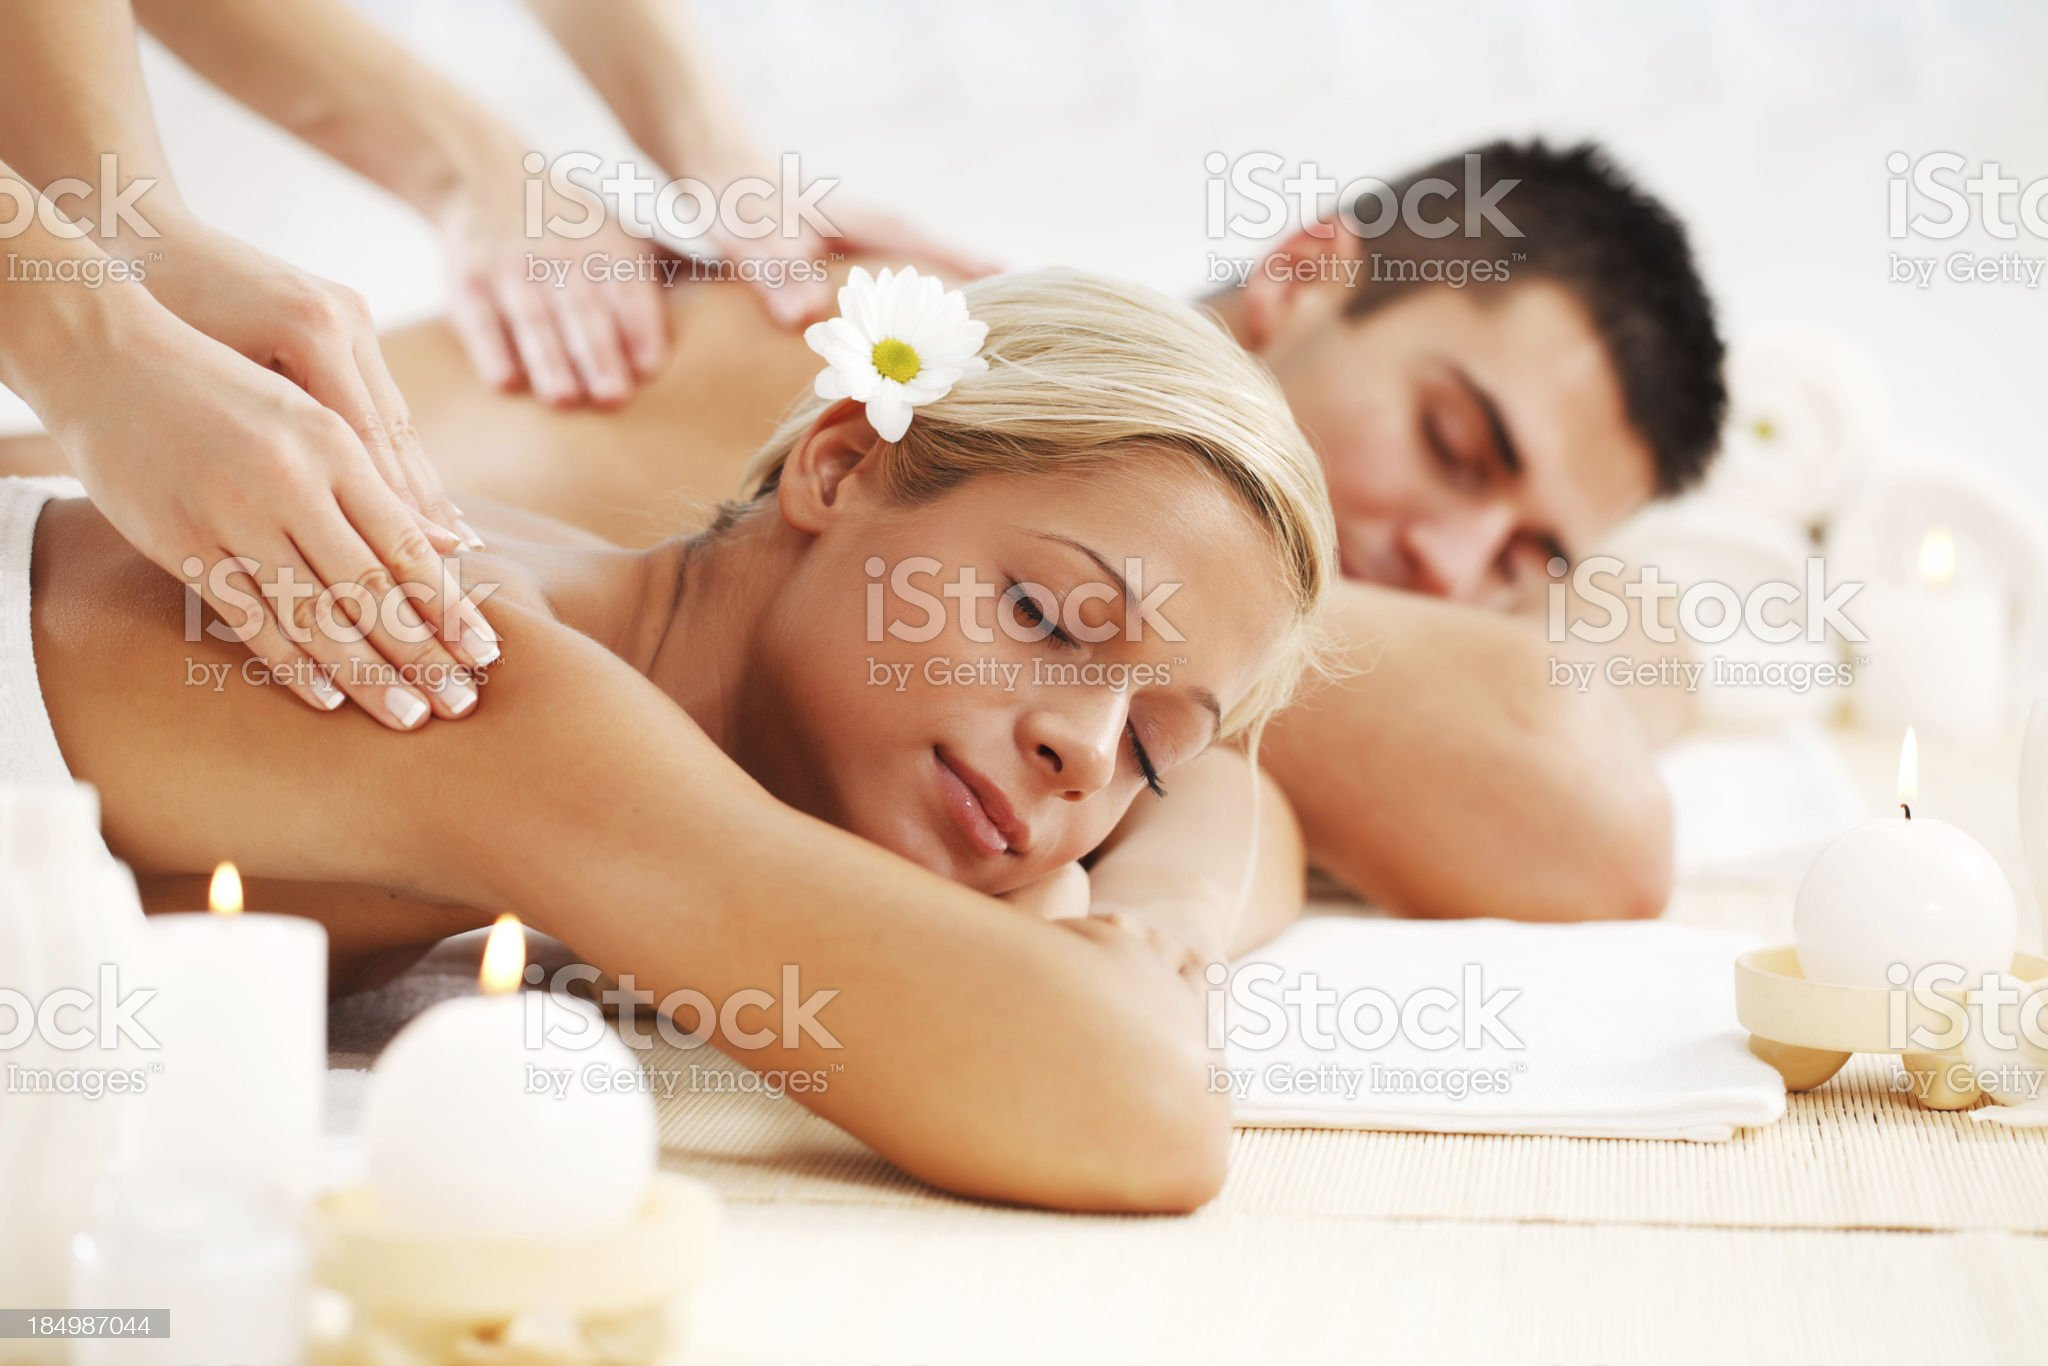 Beautiful couple enjoying in the back massage. royalty-free stock photo